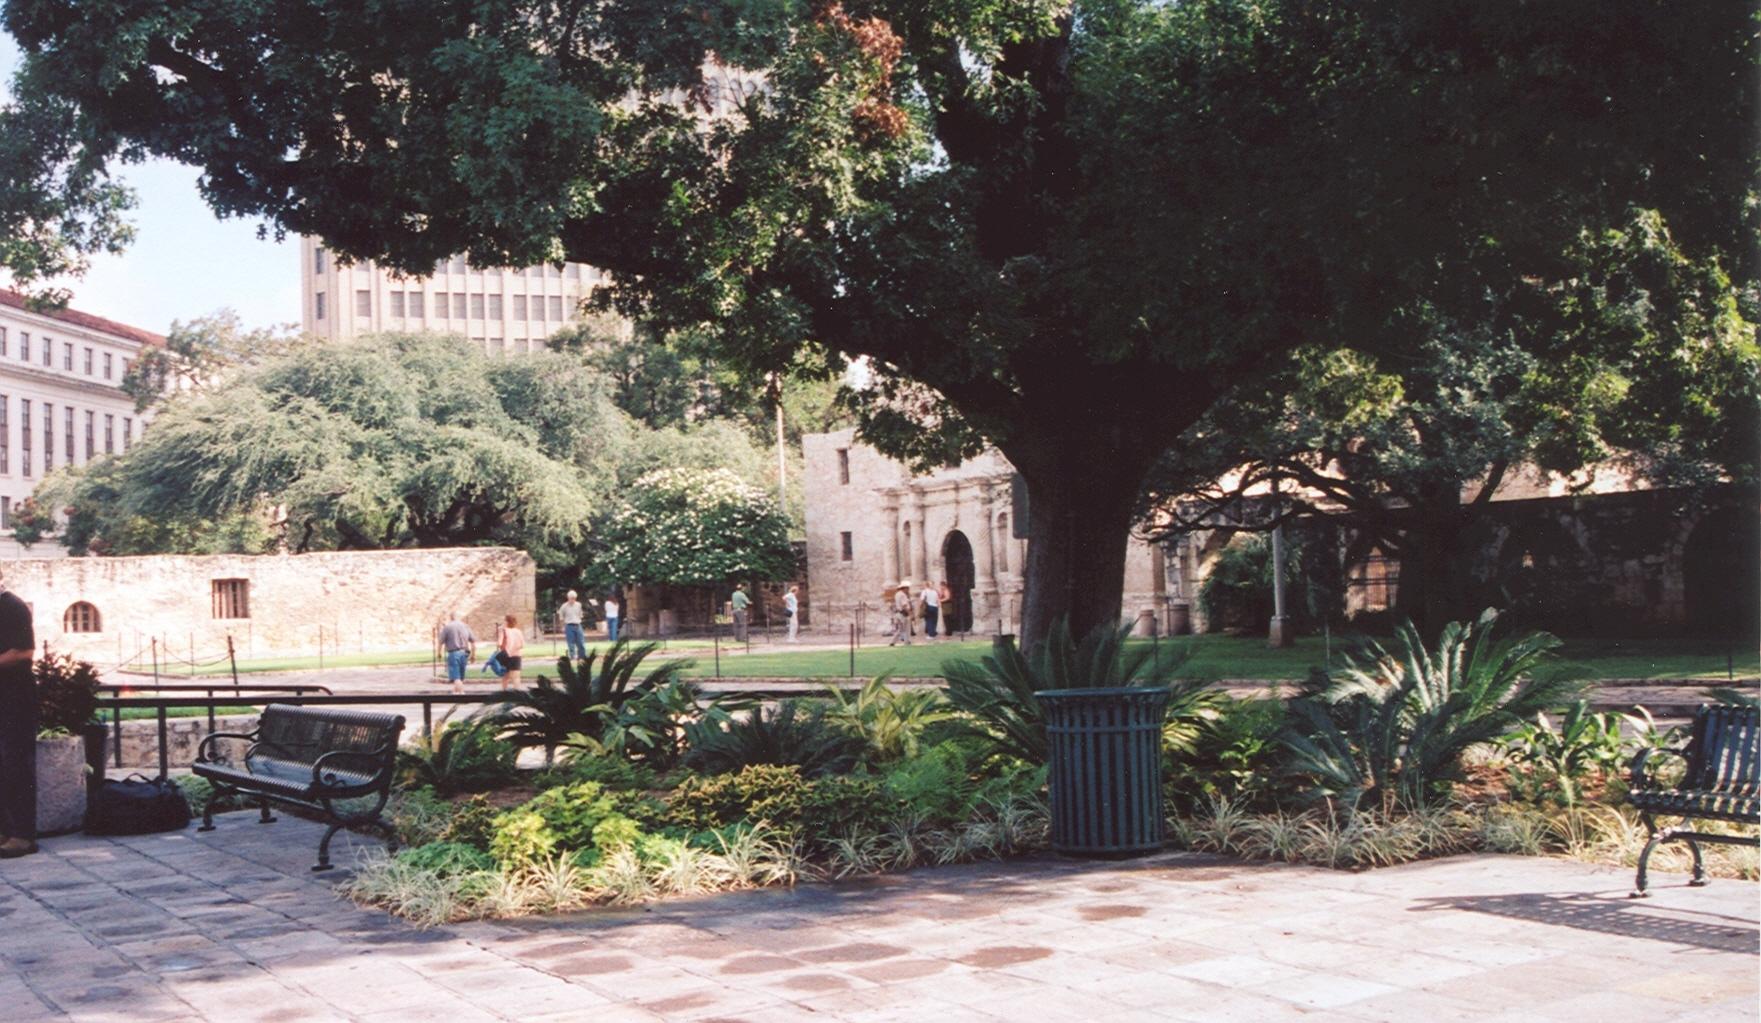 Alamo Plaza The City Of San Antonio Official City Website